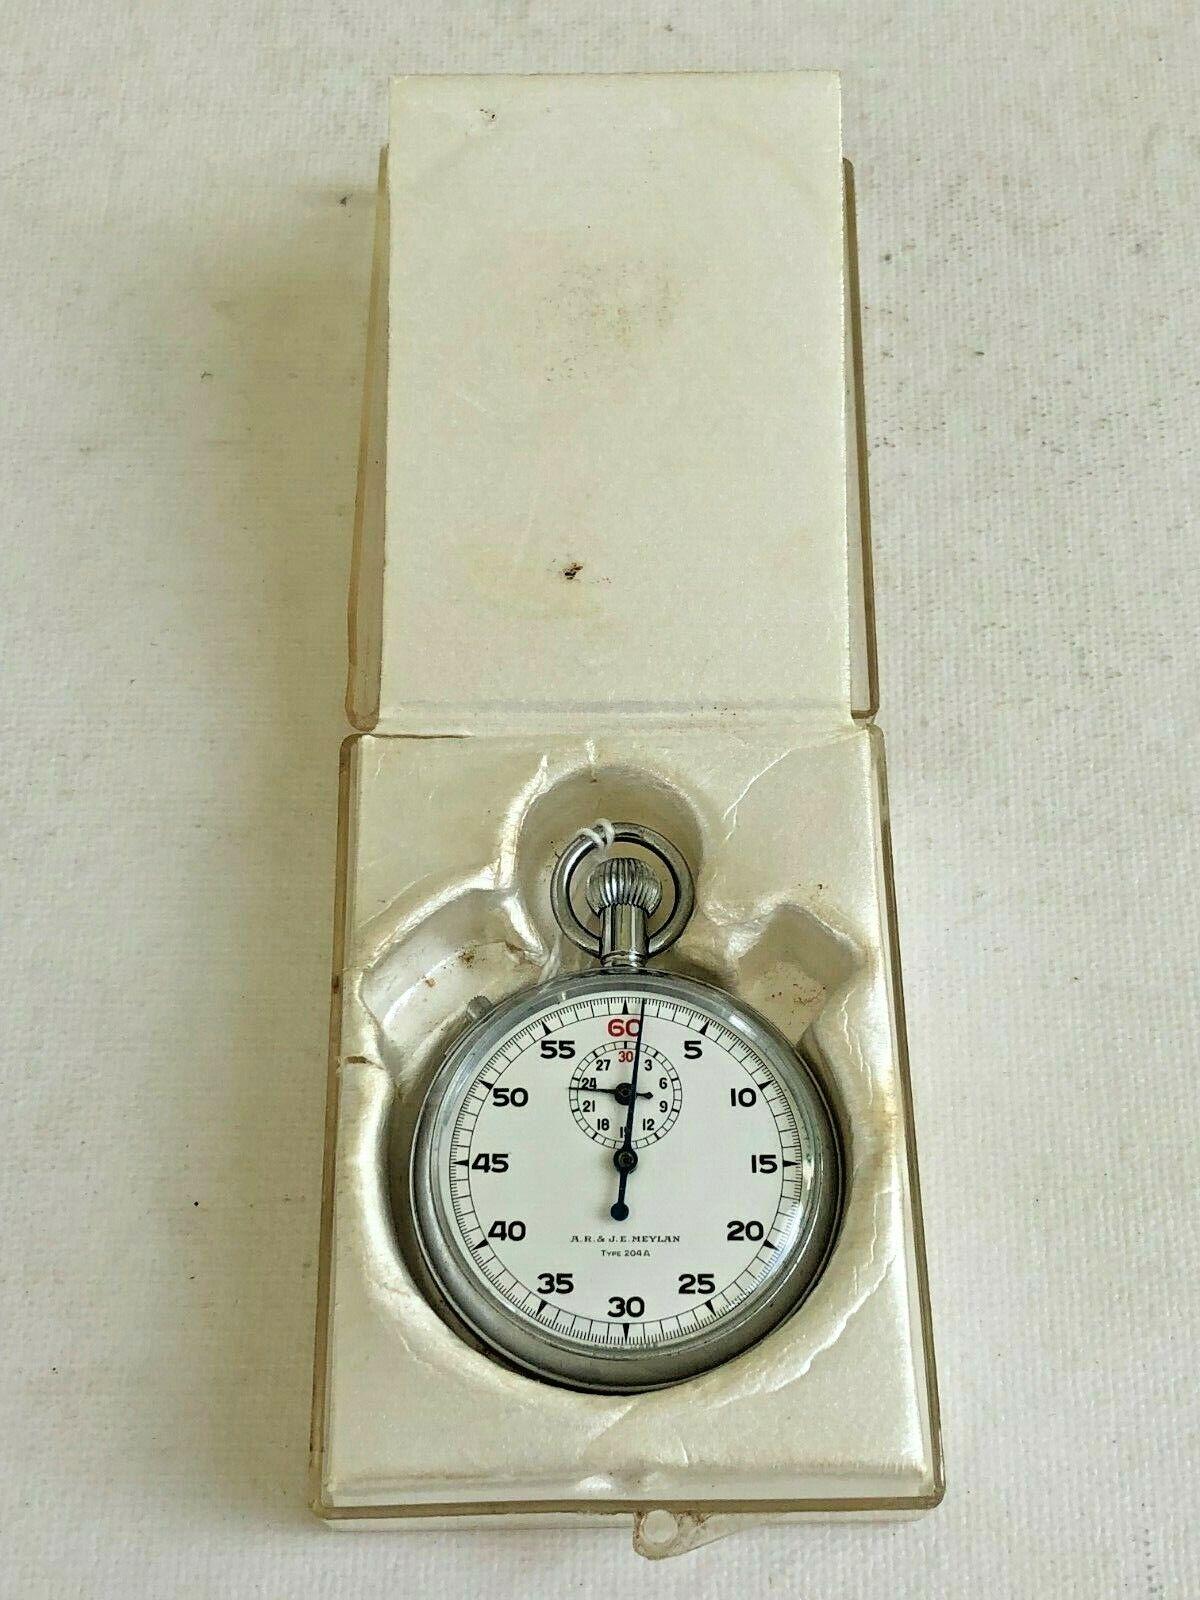 Meylan Stop Watch - Original Box Included